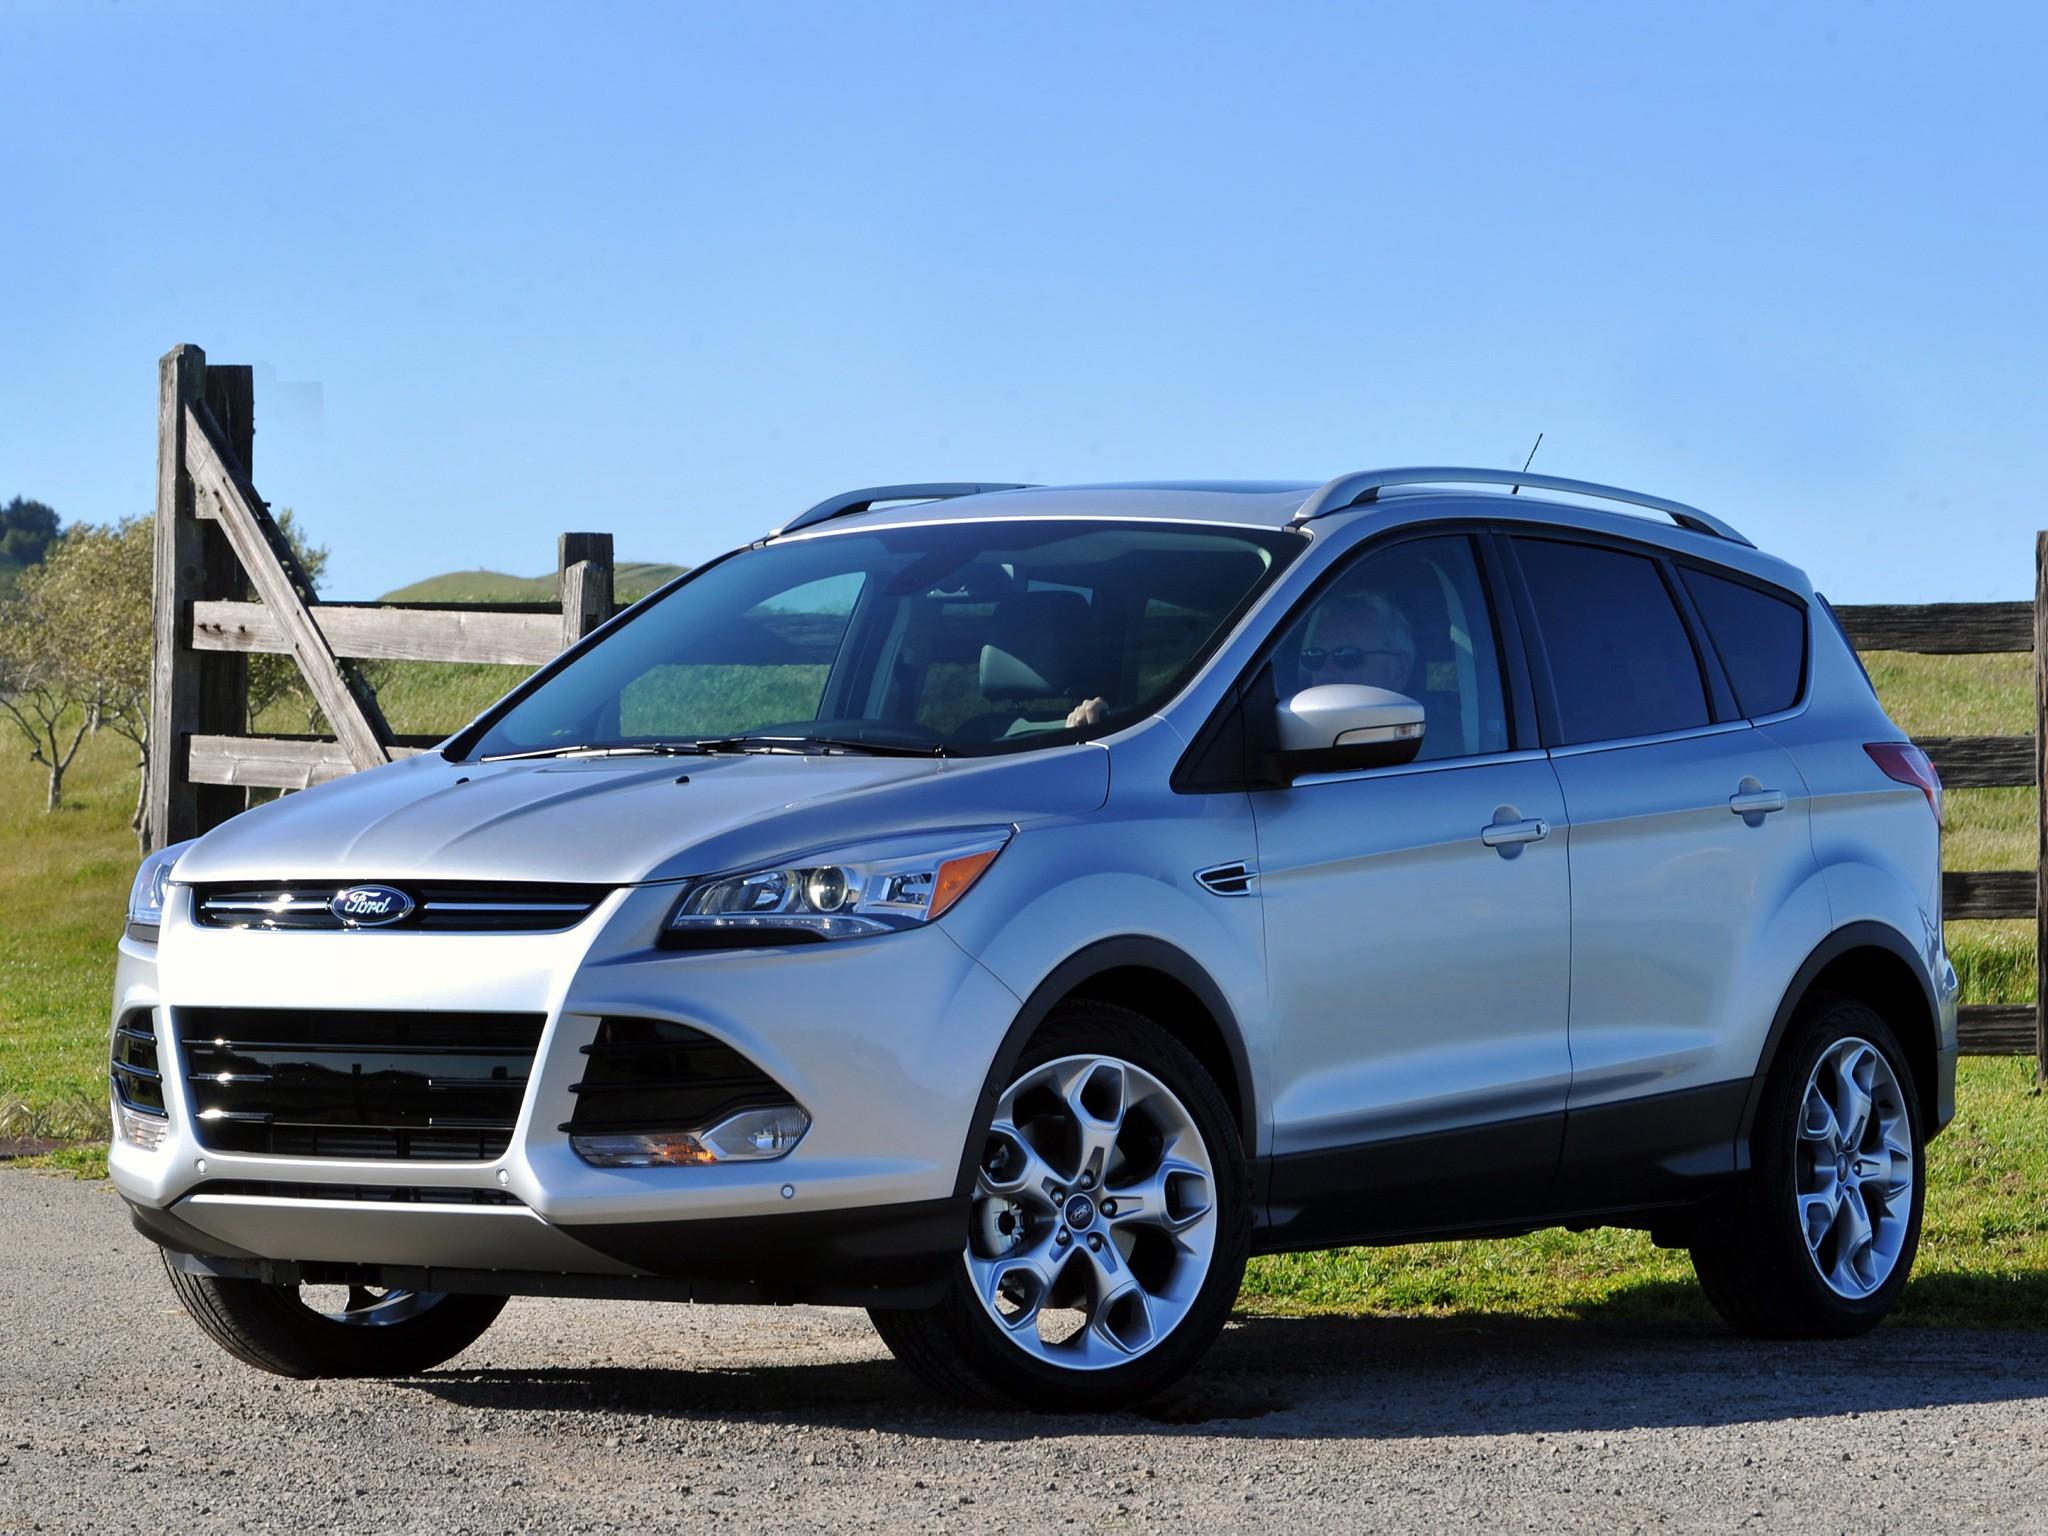 escape ford cars usa usuario manual gratis pdf suv models motor specs ecoboost visit equinox mileage fuel